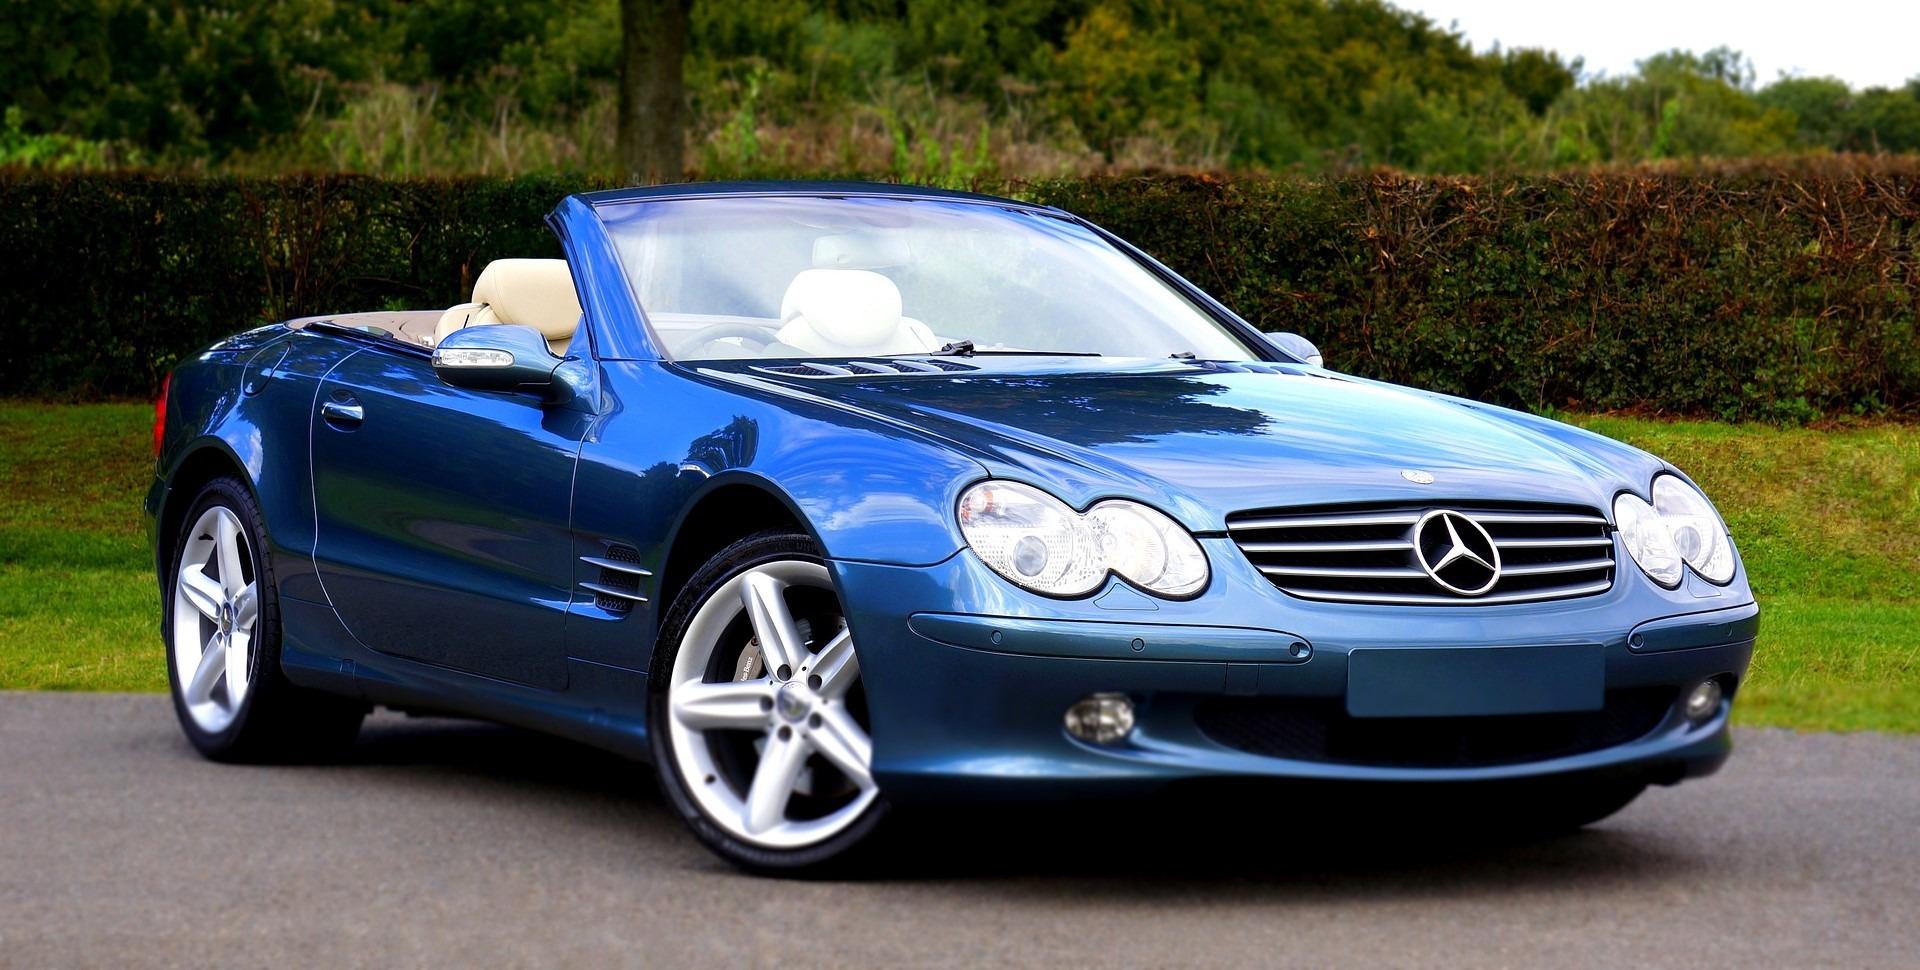 Parked Mercedez Benz in Atlantic City - GoodwillCarDonation.org